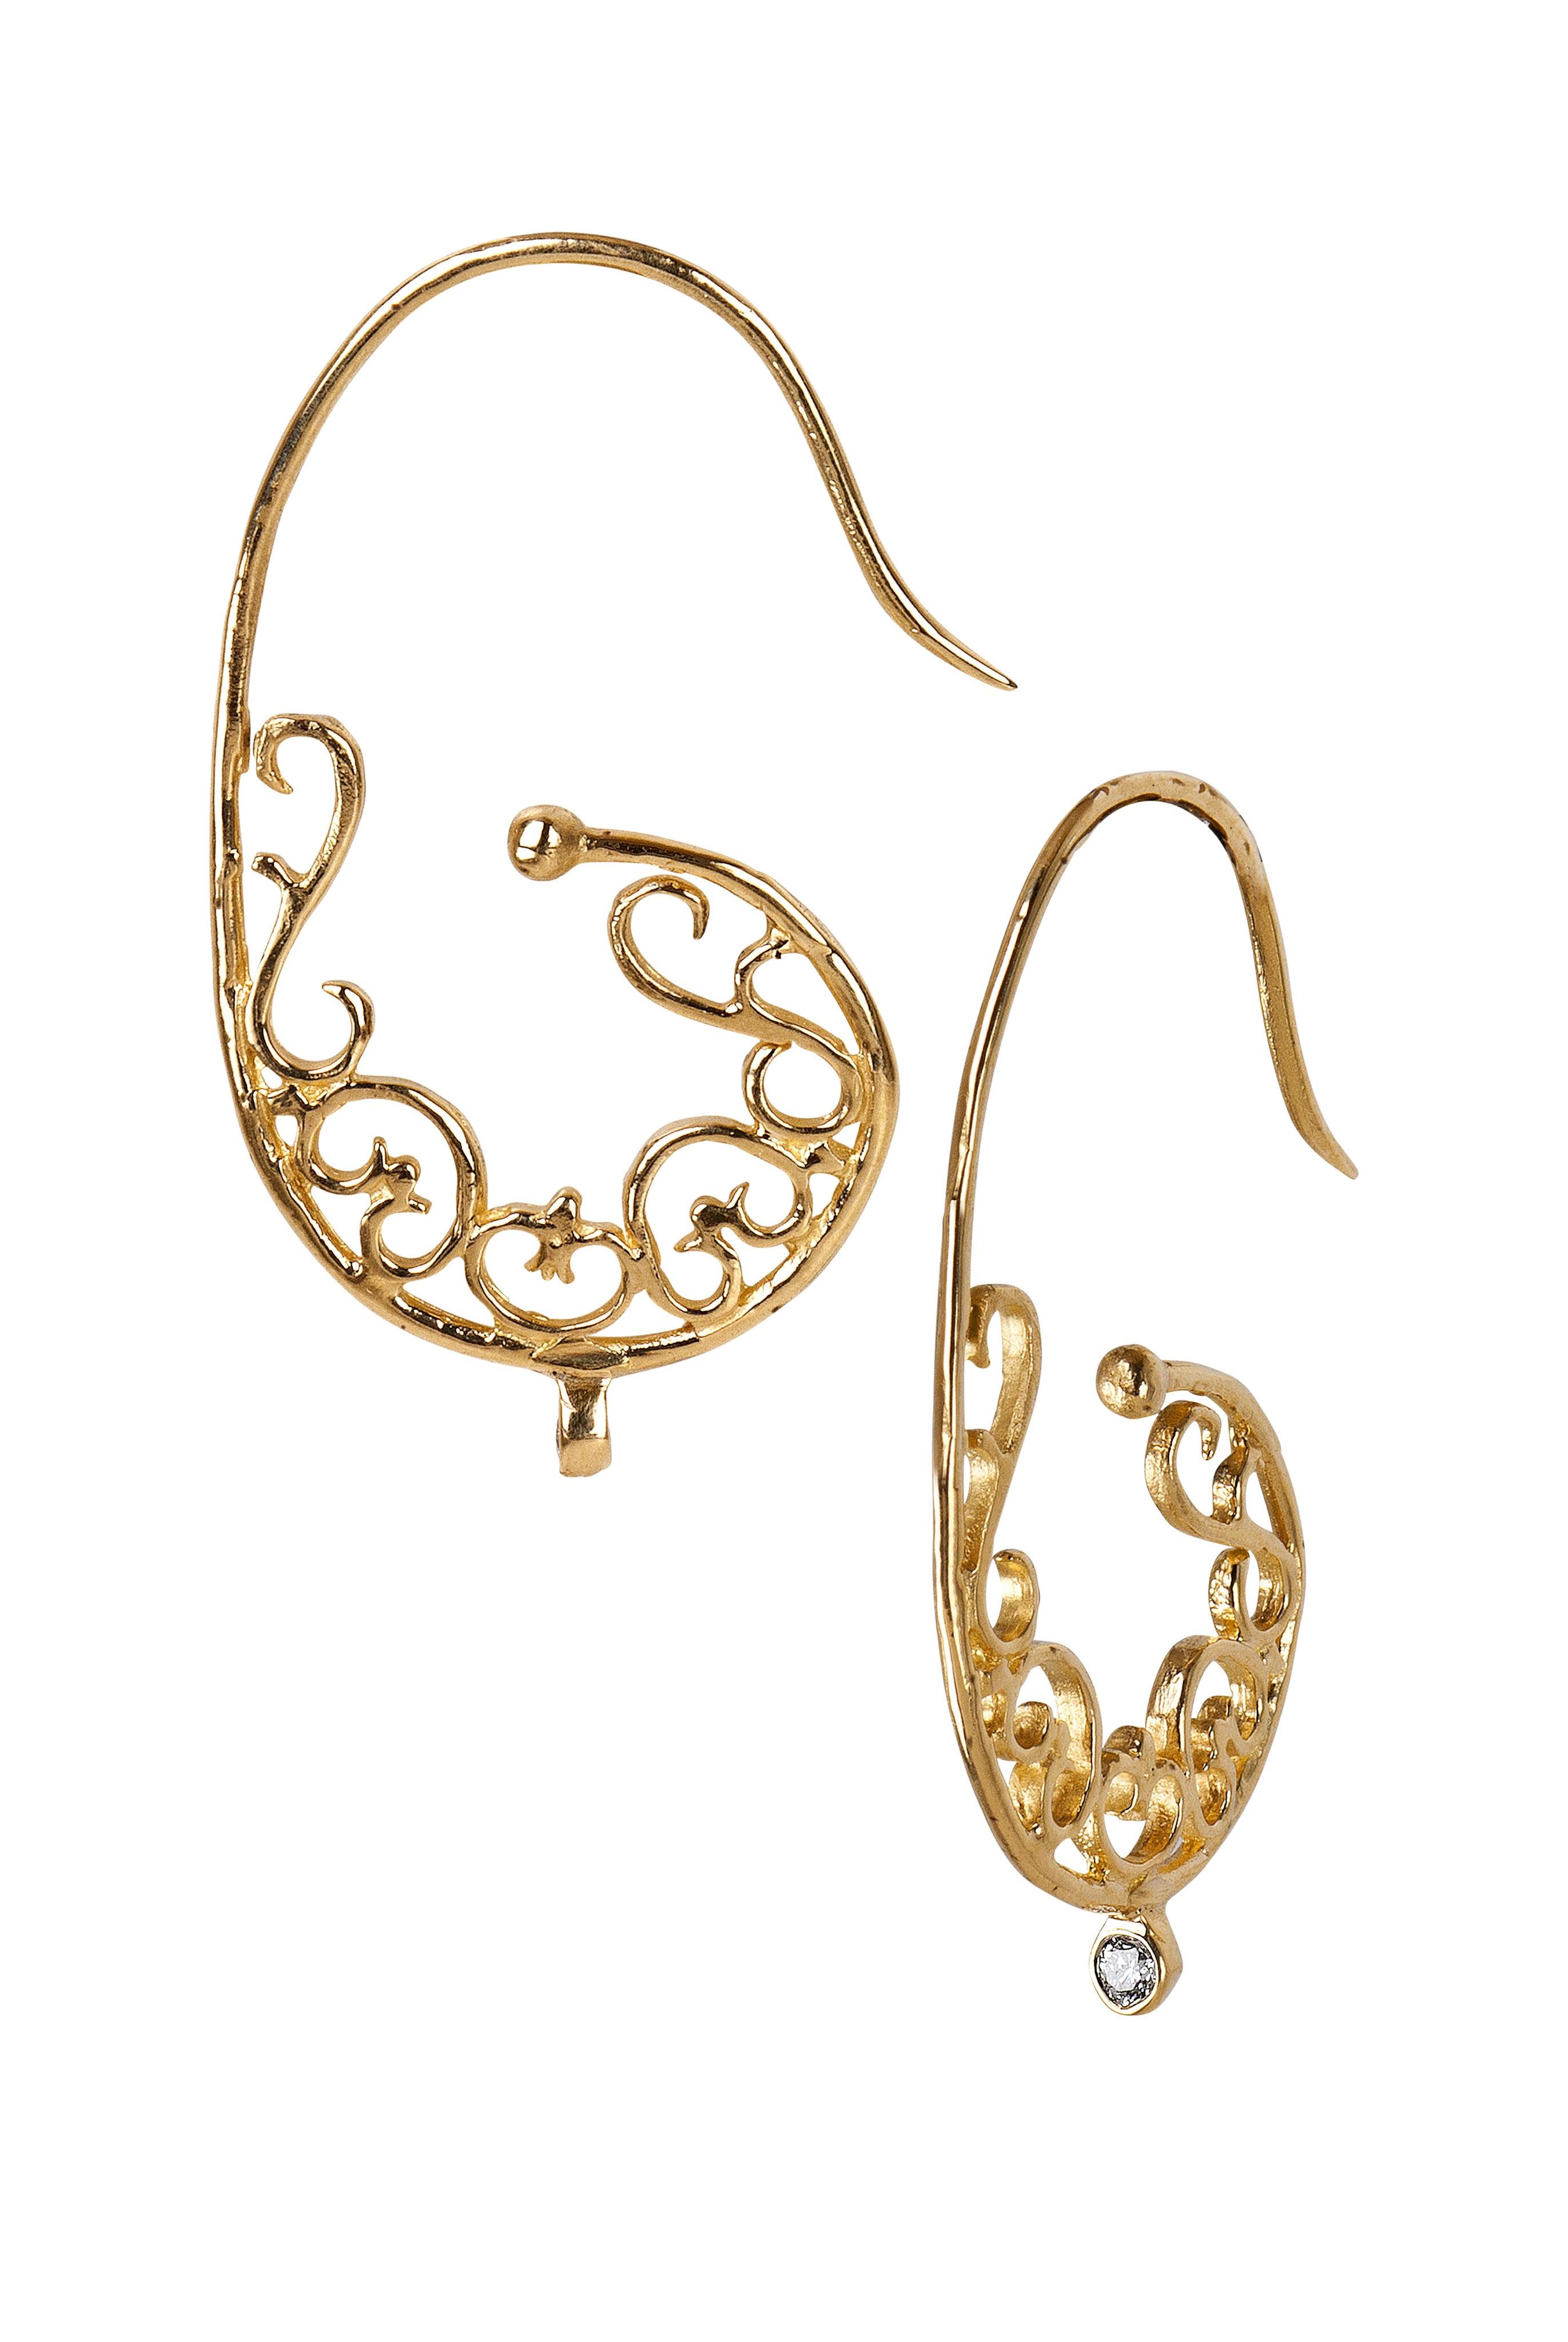 The Jewel - Just Jules - Lookbook - Gold Detail Earrings